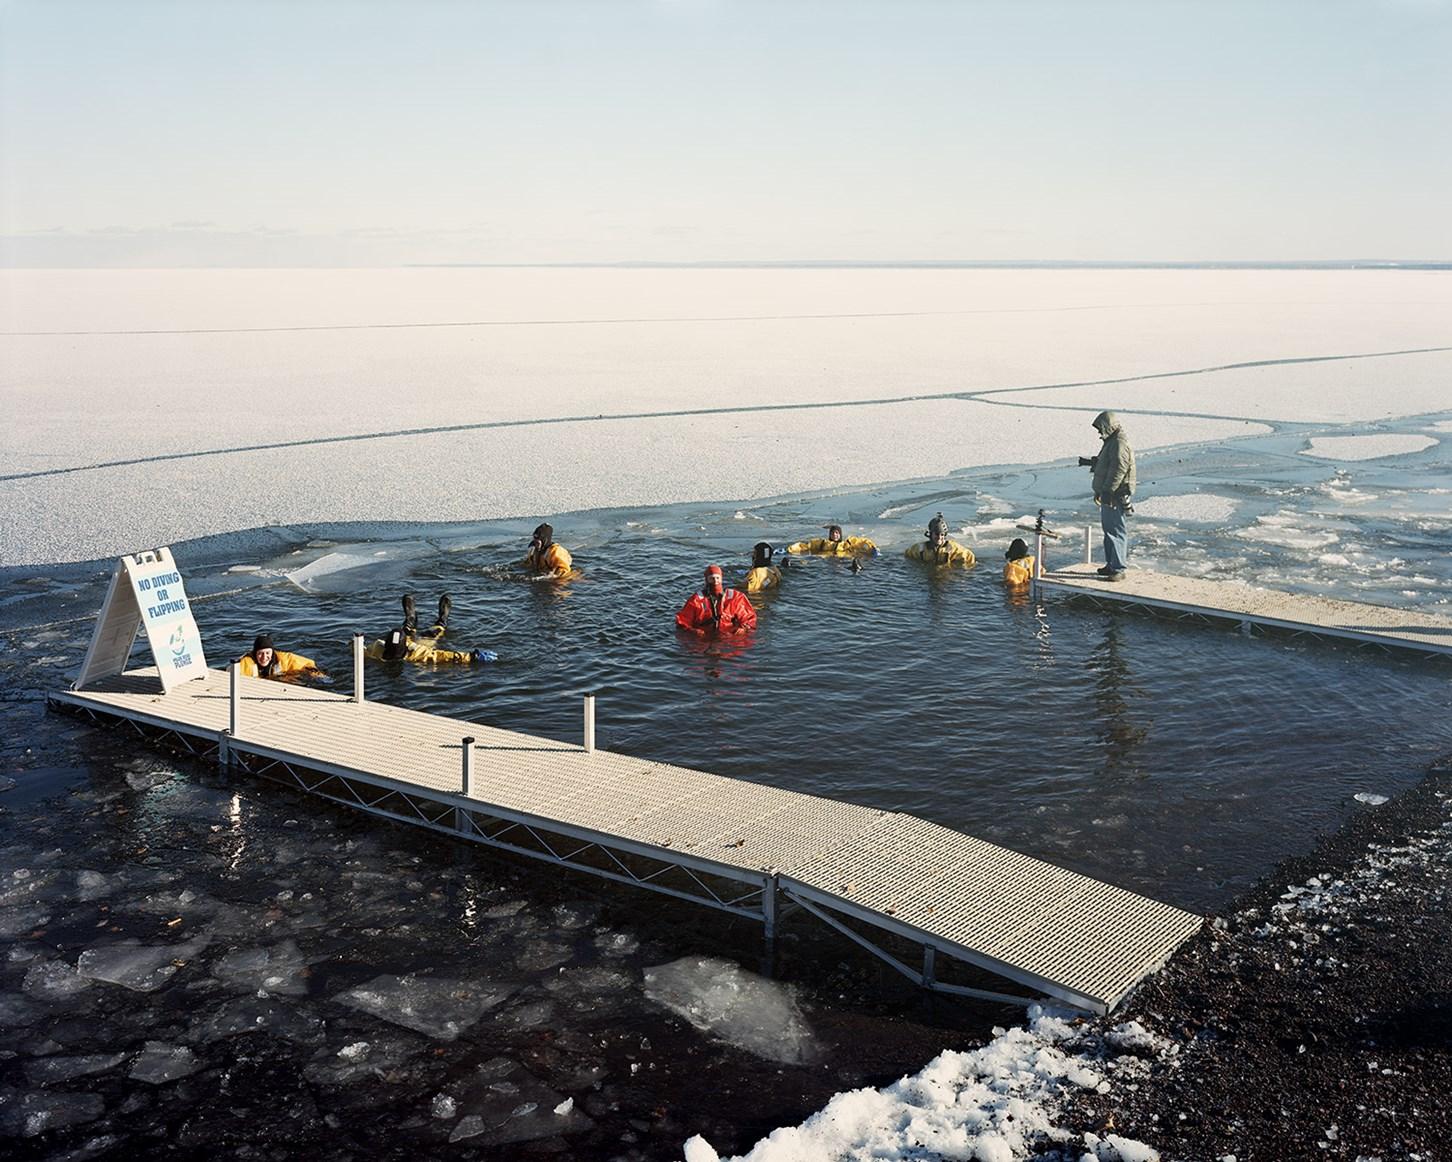 Polar Plunge Safety Crew, Duluth, Minnesota, February 2013